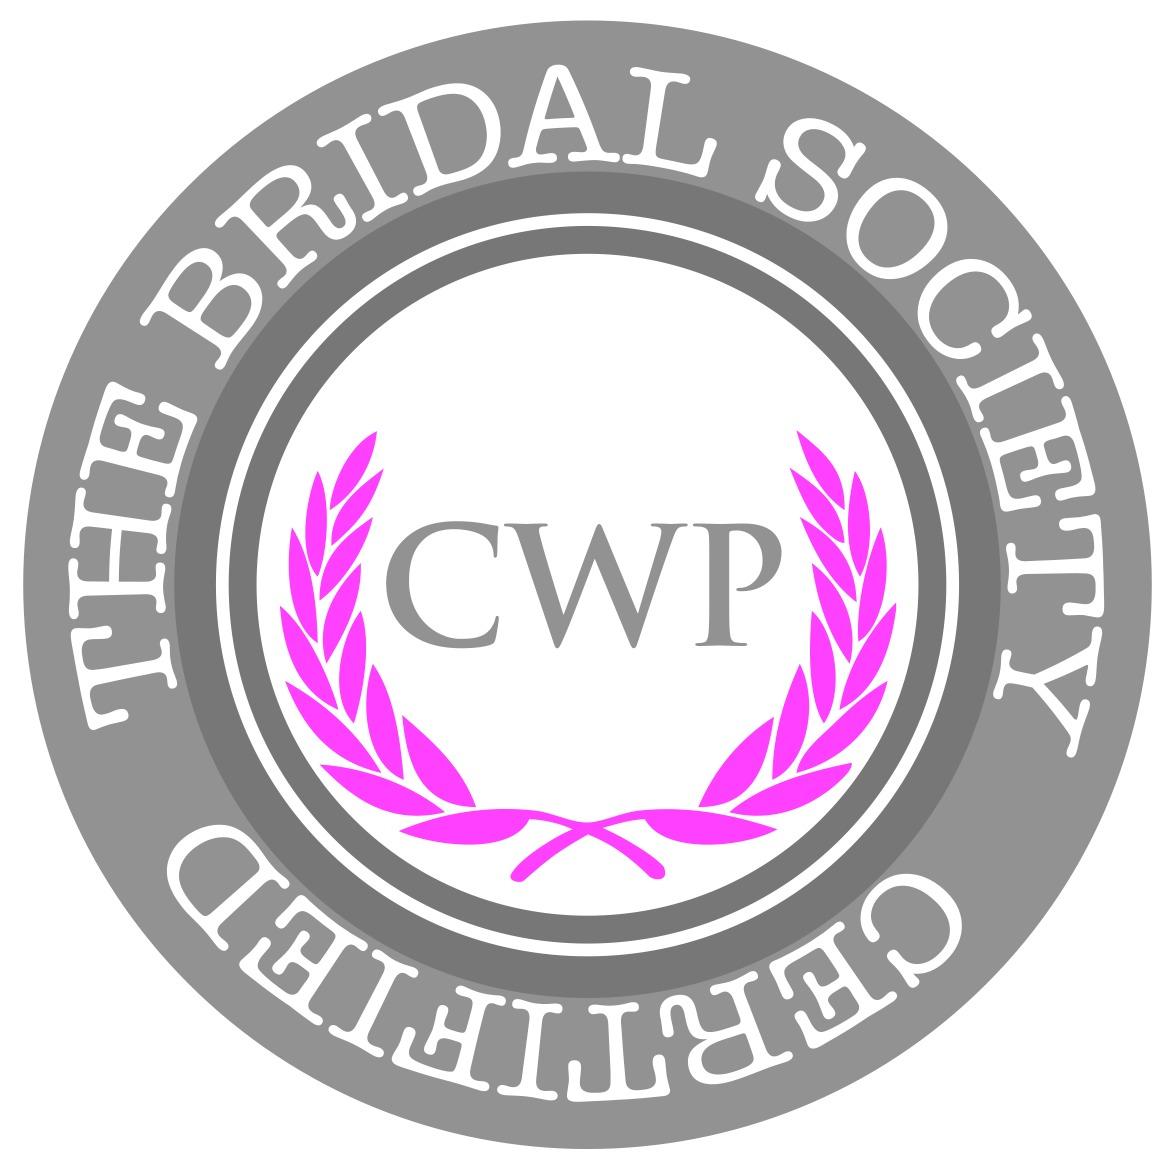 CWP_NEW_300.jpg